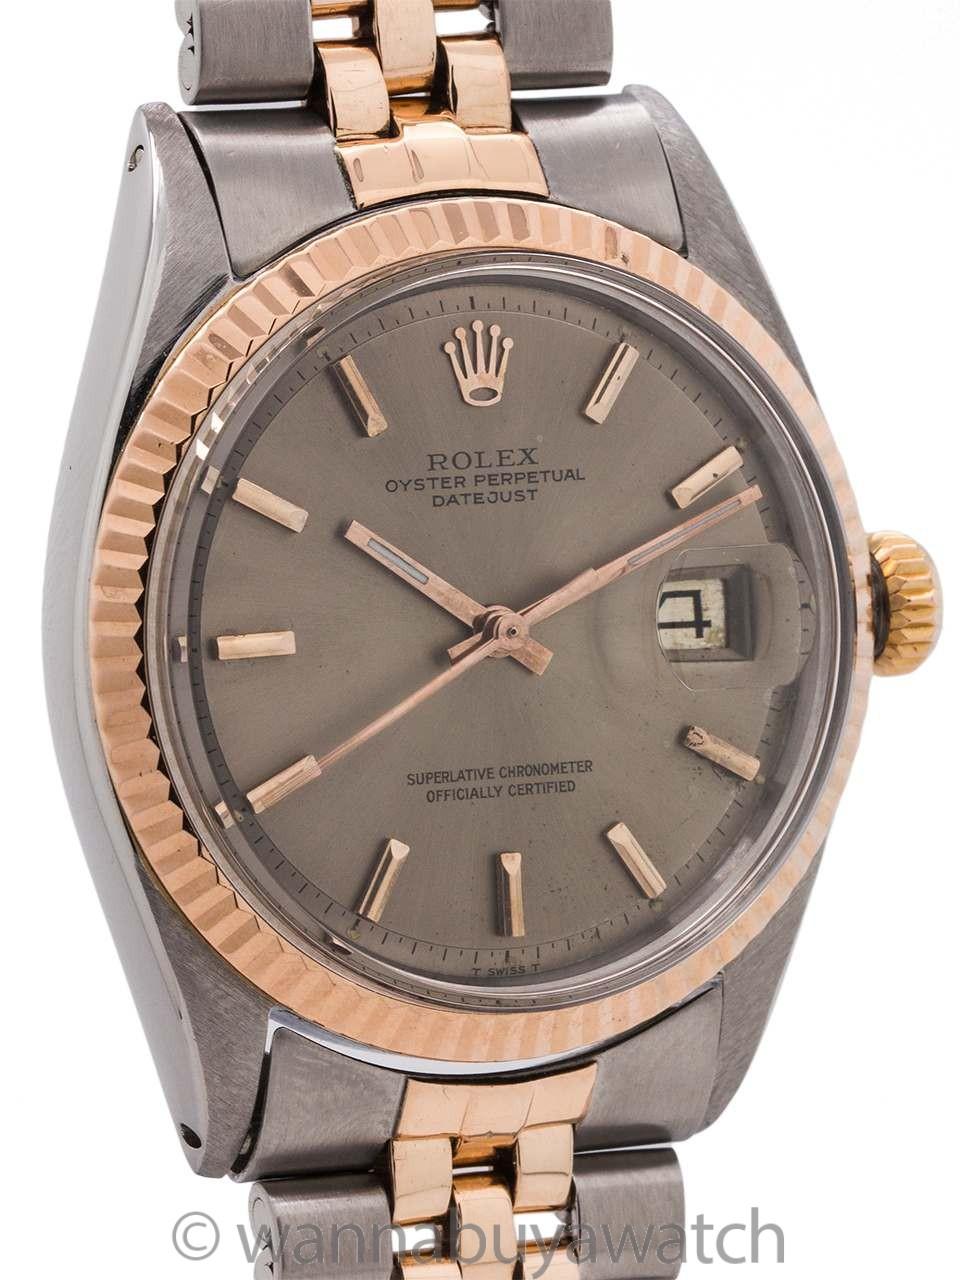 Rolex SS/14K Rose Gold Datejust ref 1601 circa 1968